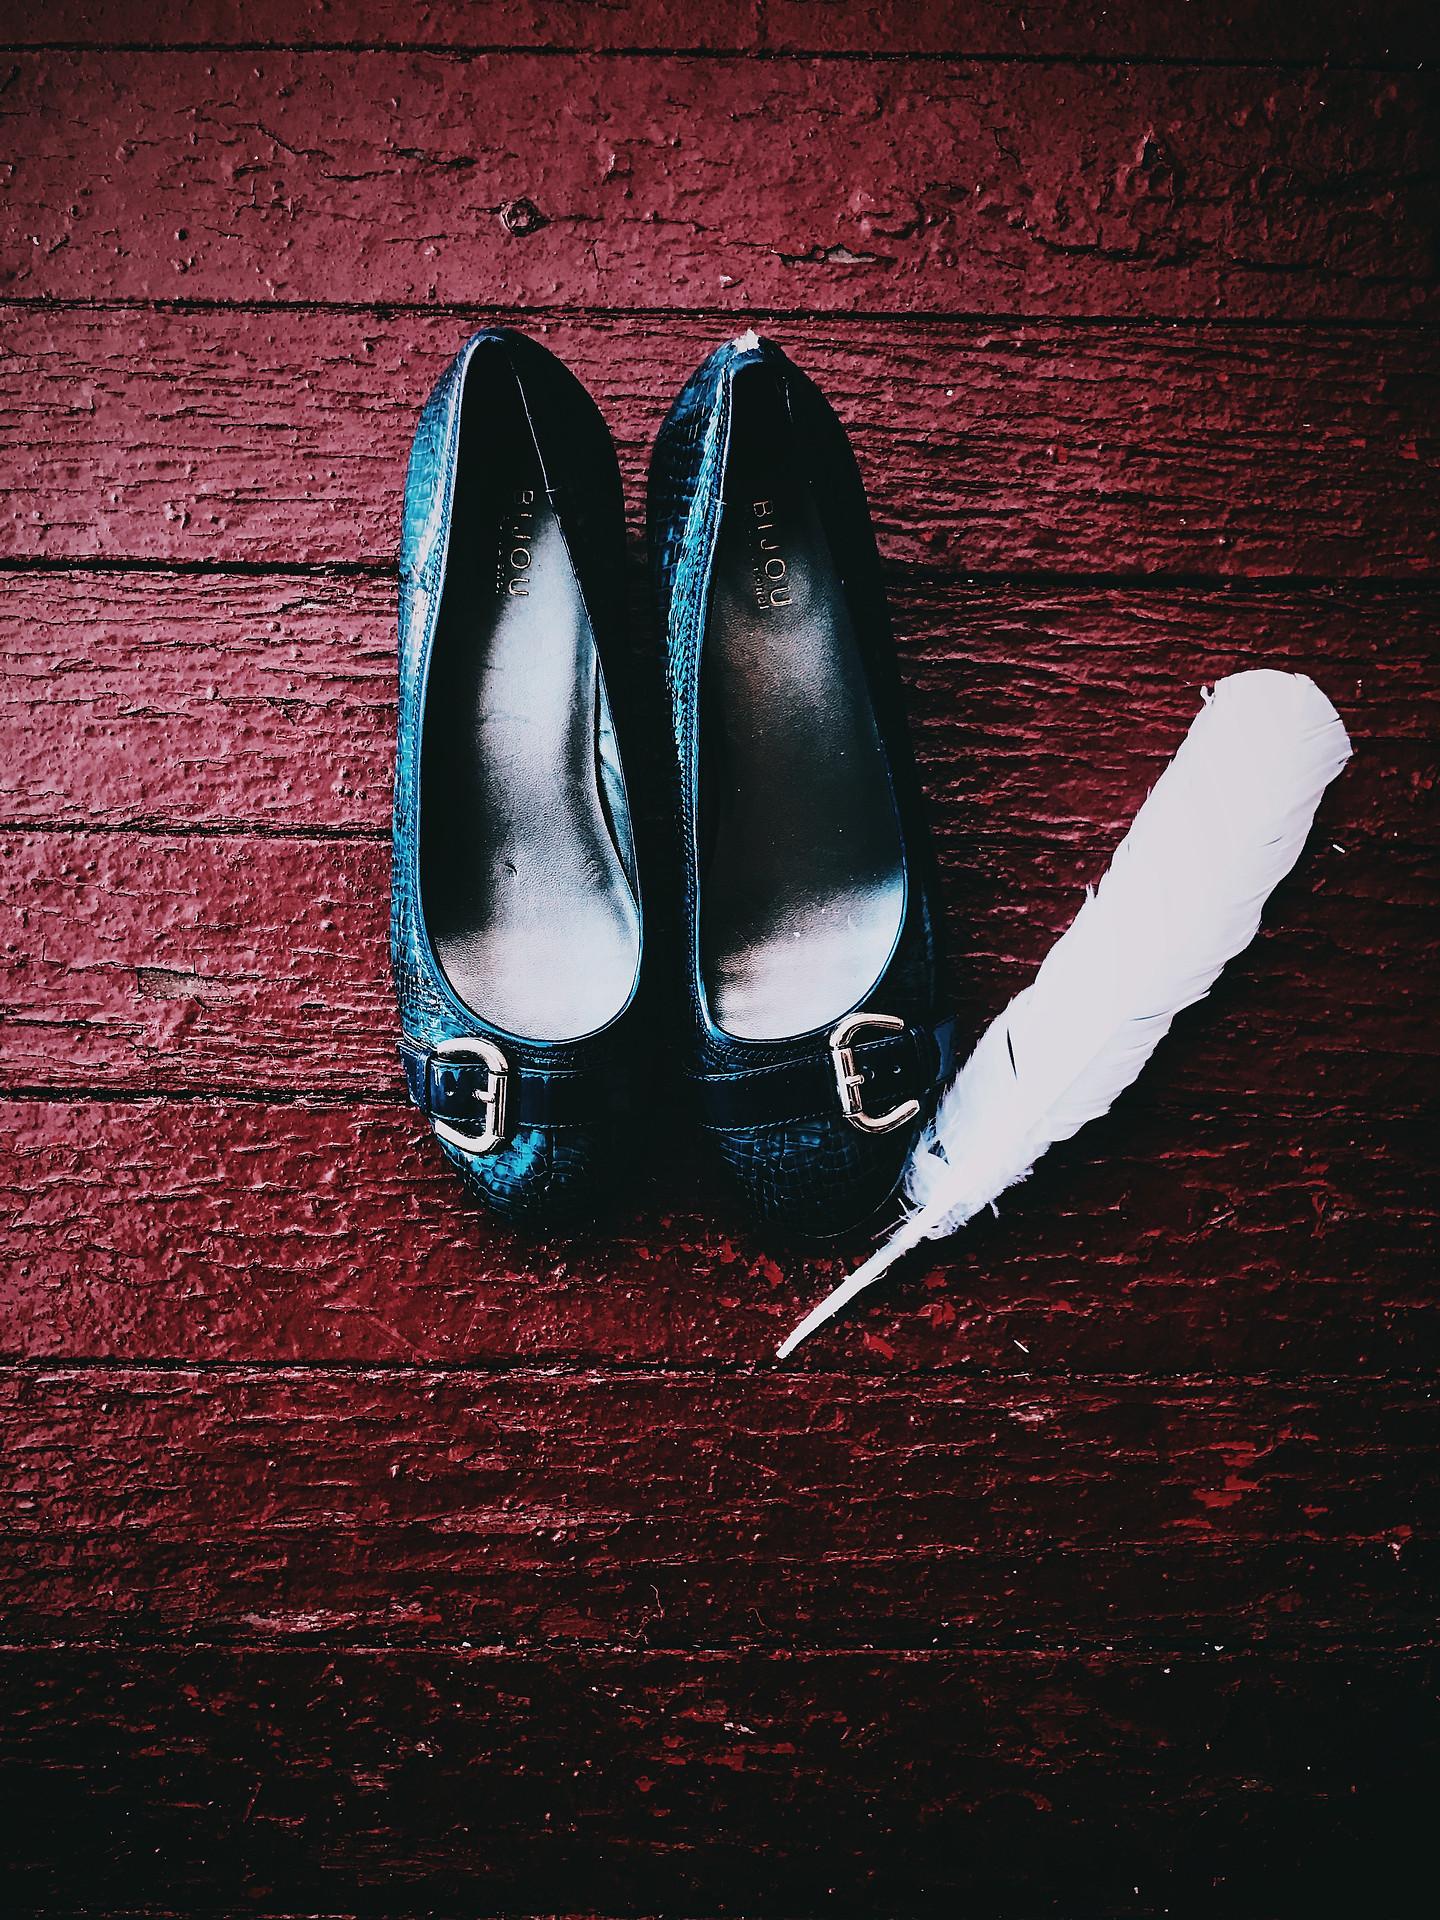 Those Blue Shoes